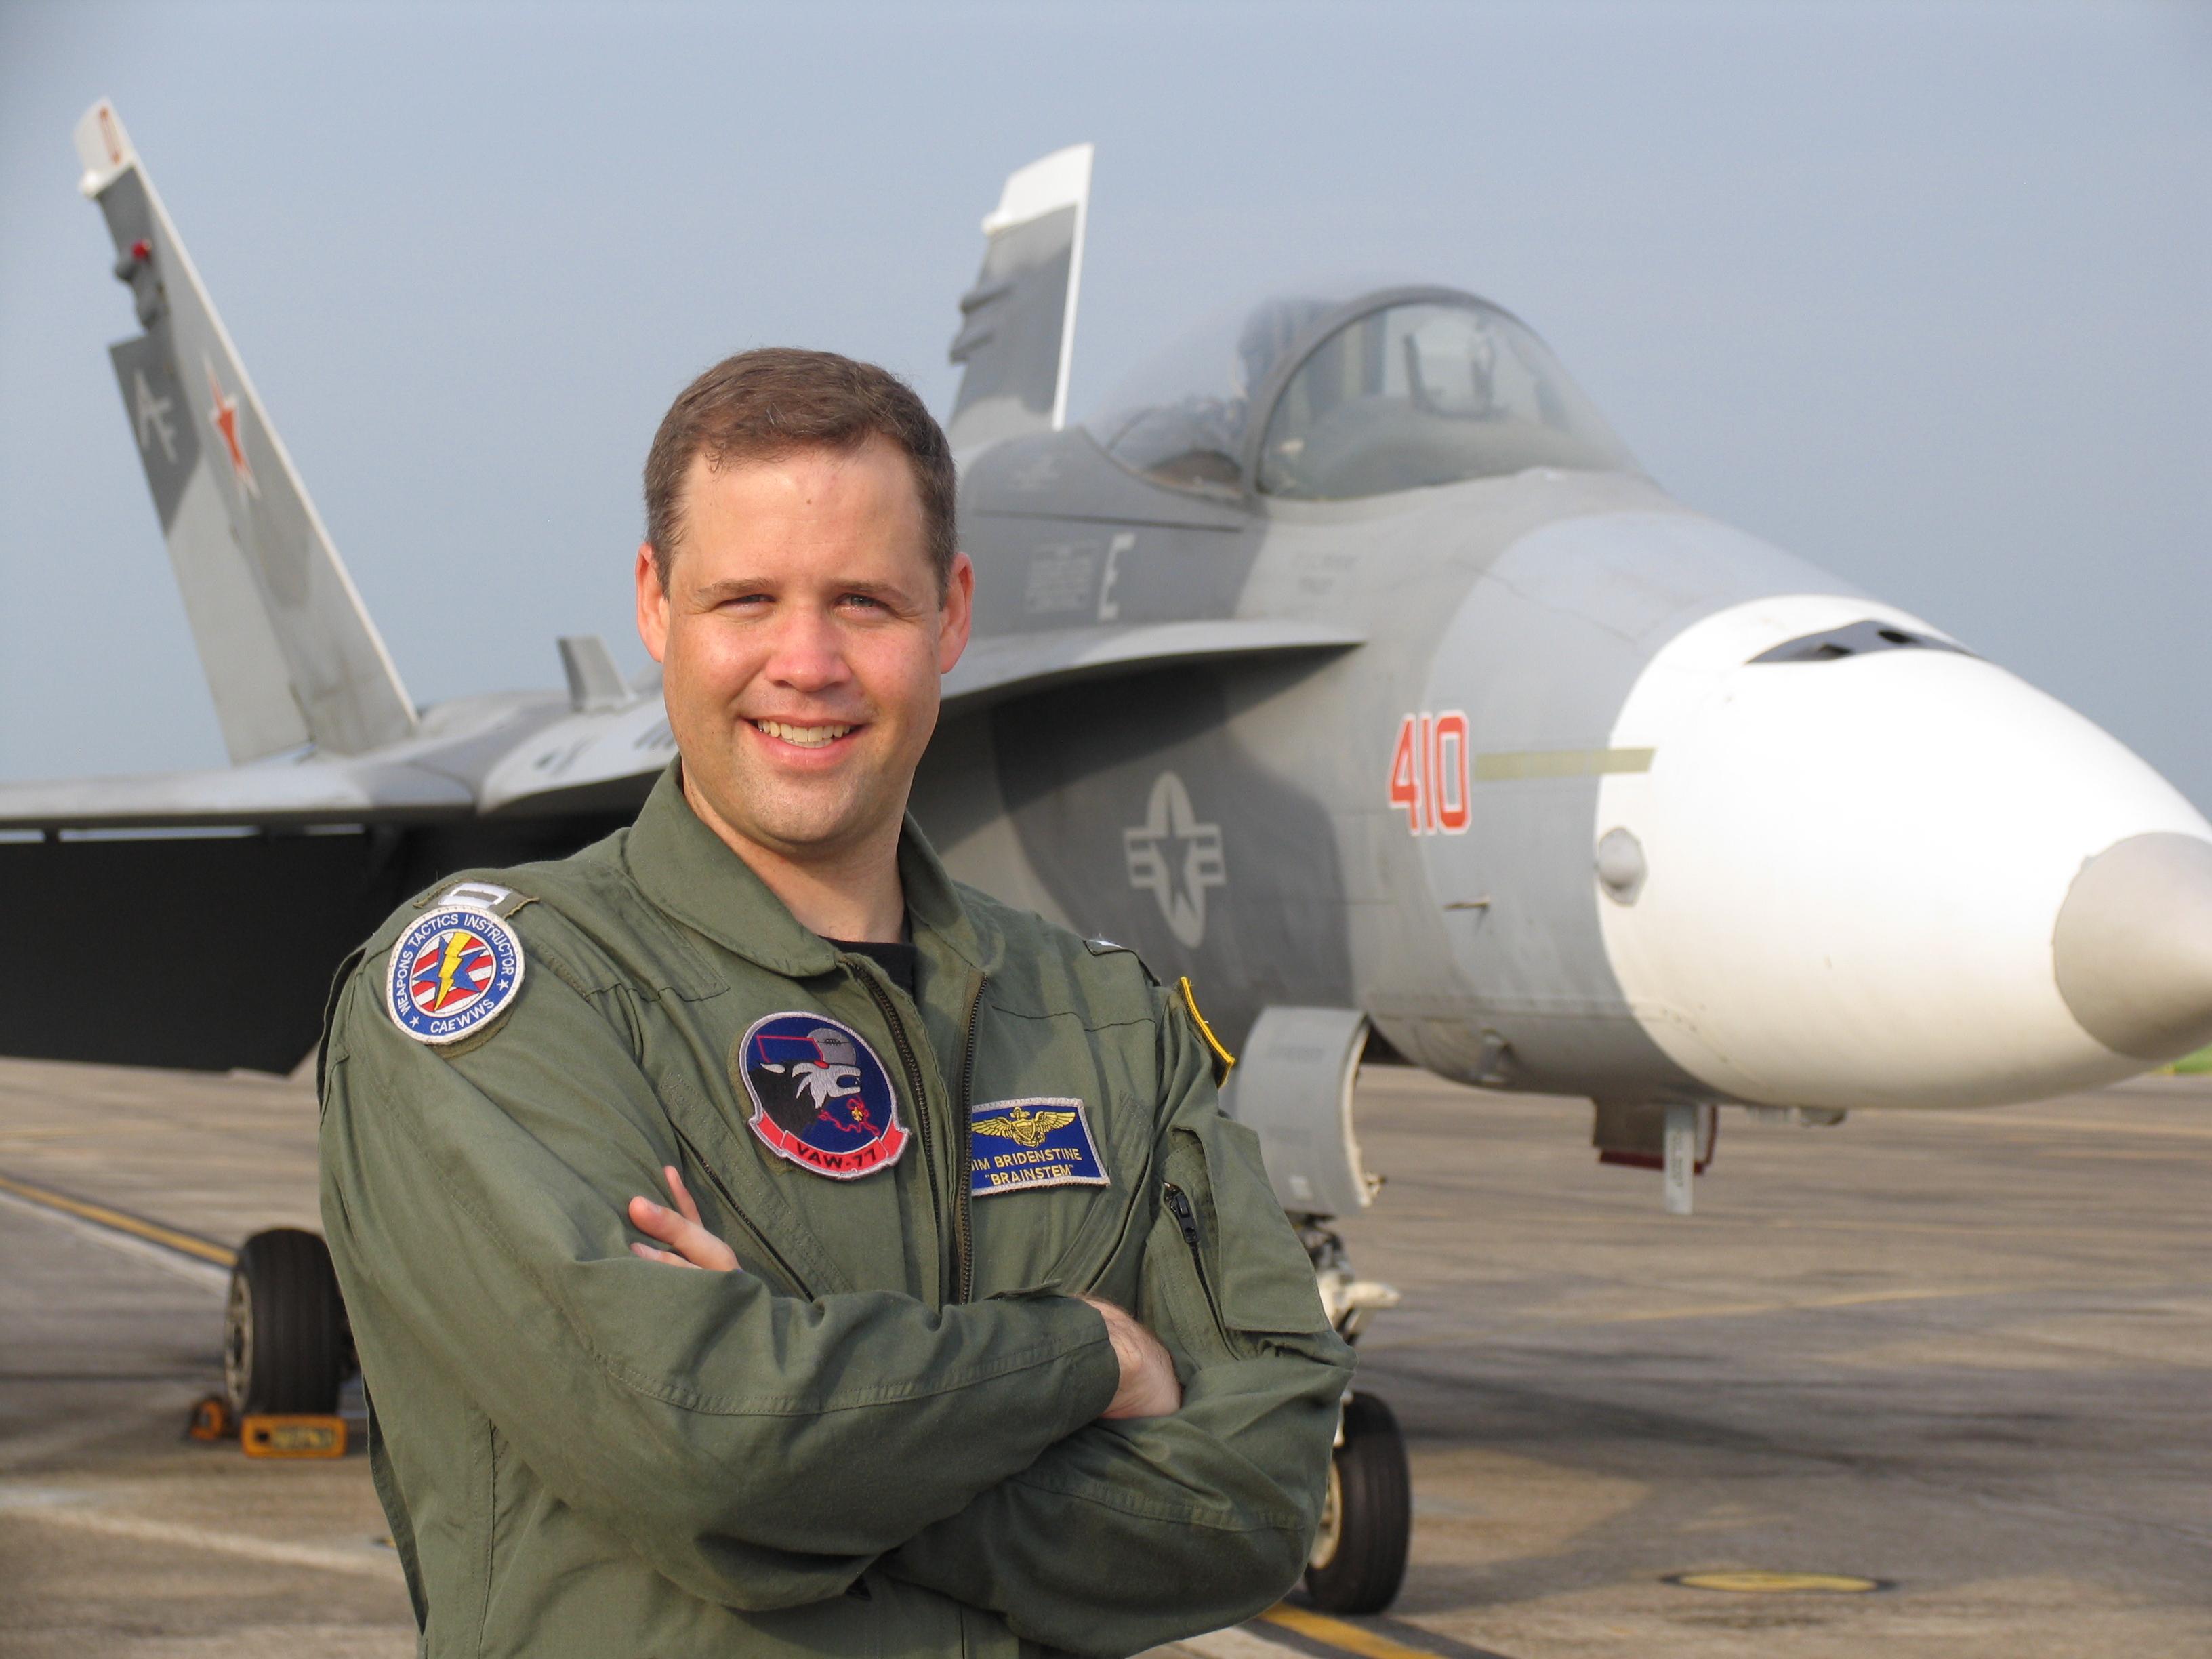 President Donald Trump to appoint James Bridenstine to head NASA